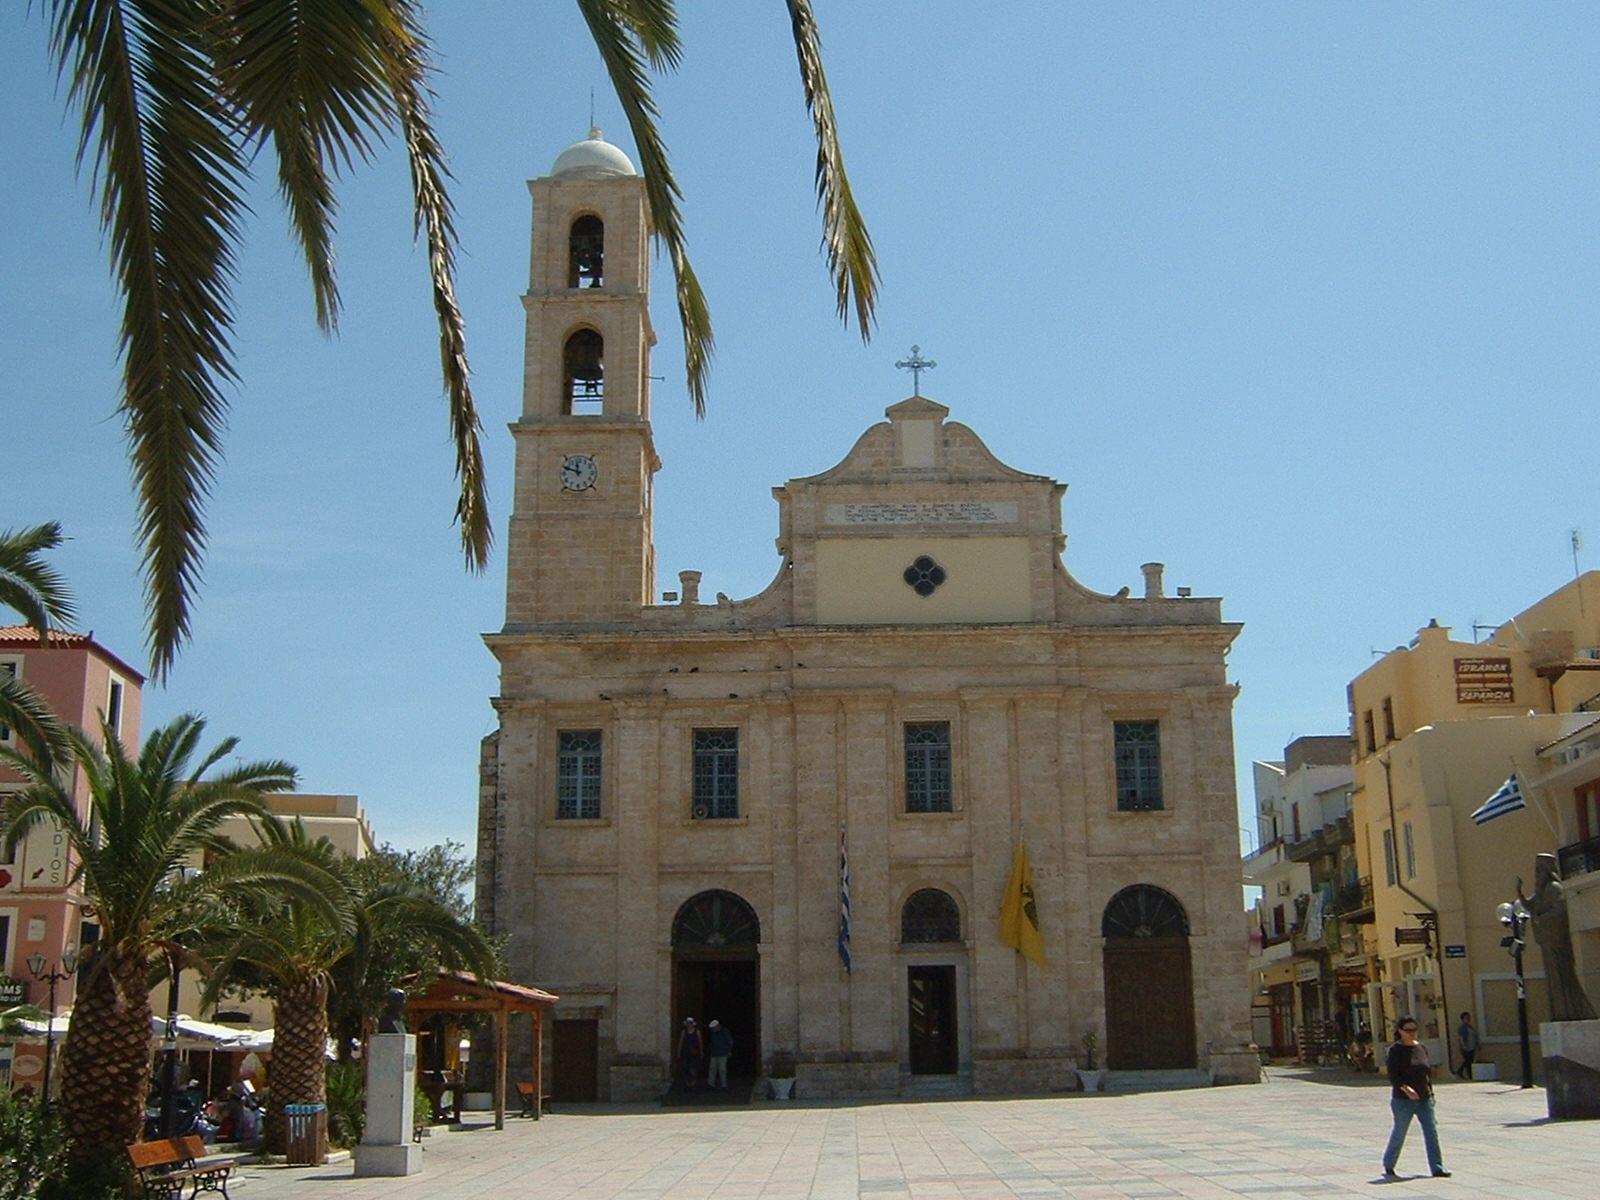 Pelerinaj de Paste - Insula Creta si Muntele Atos